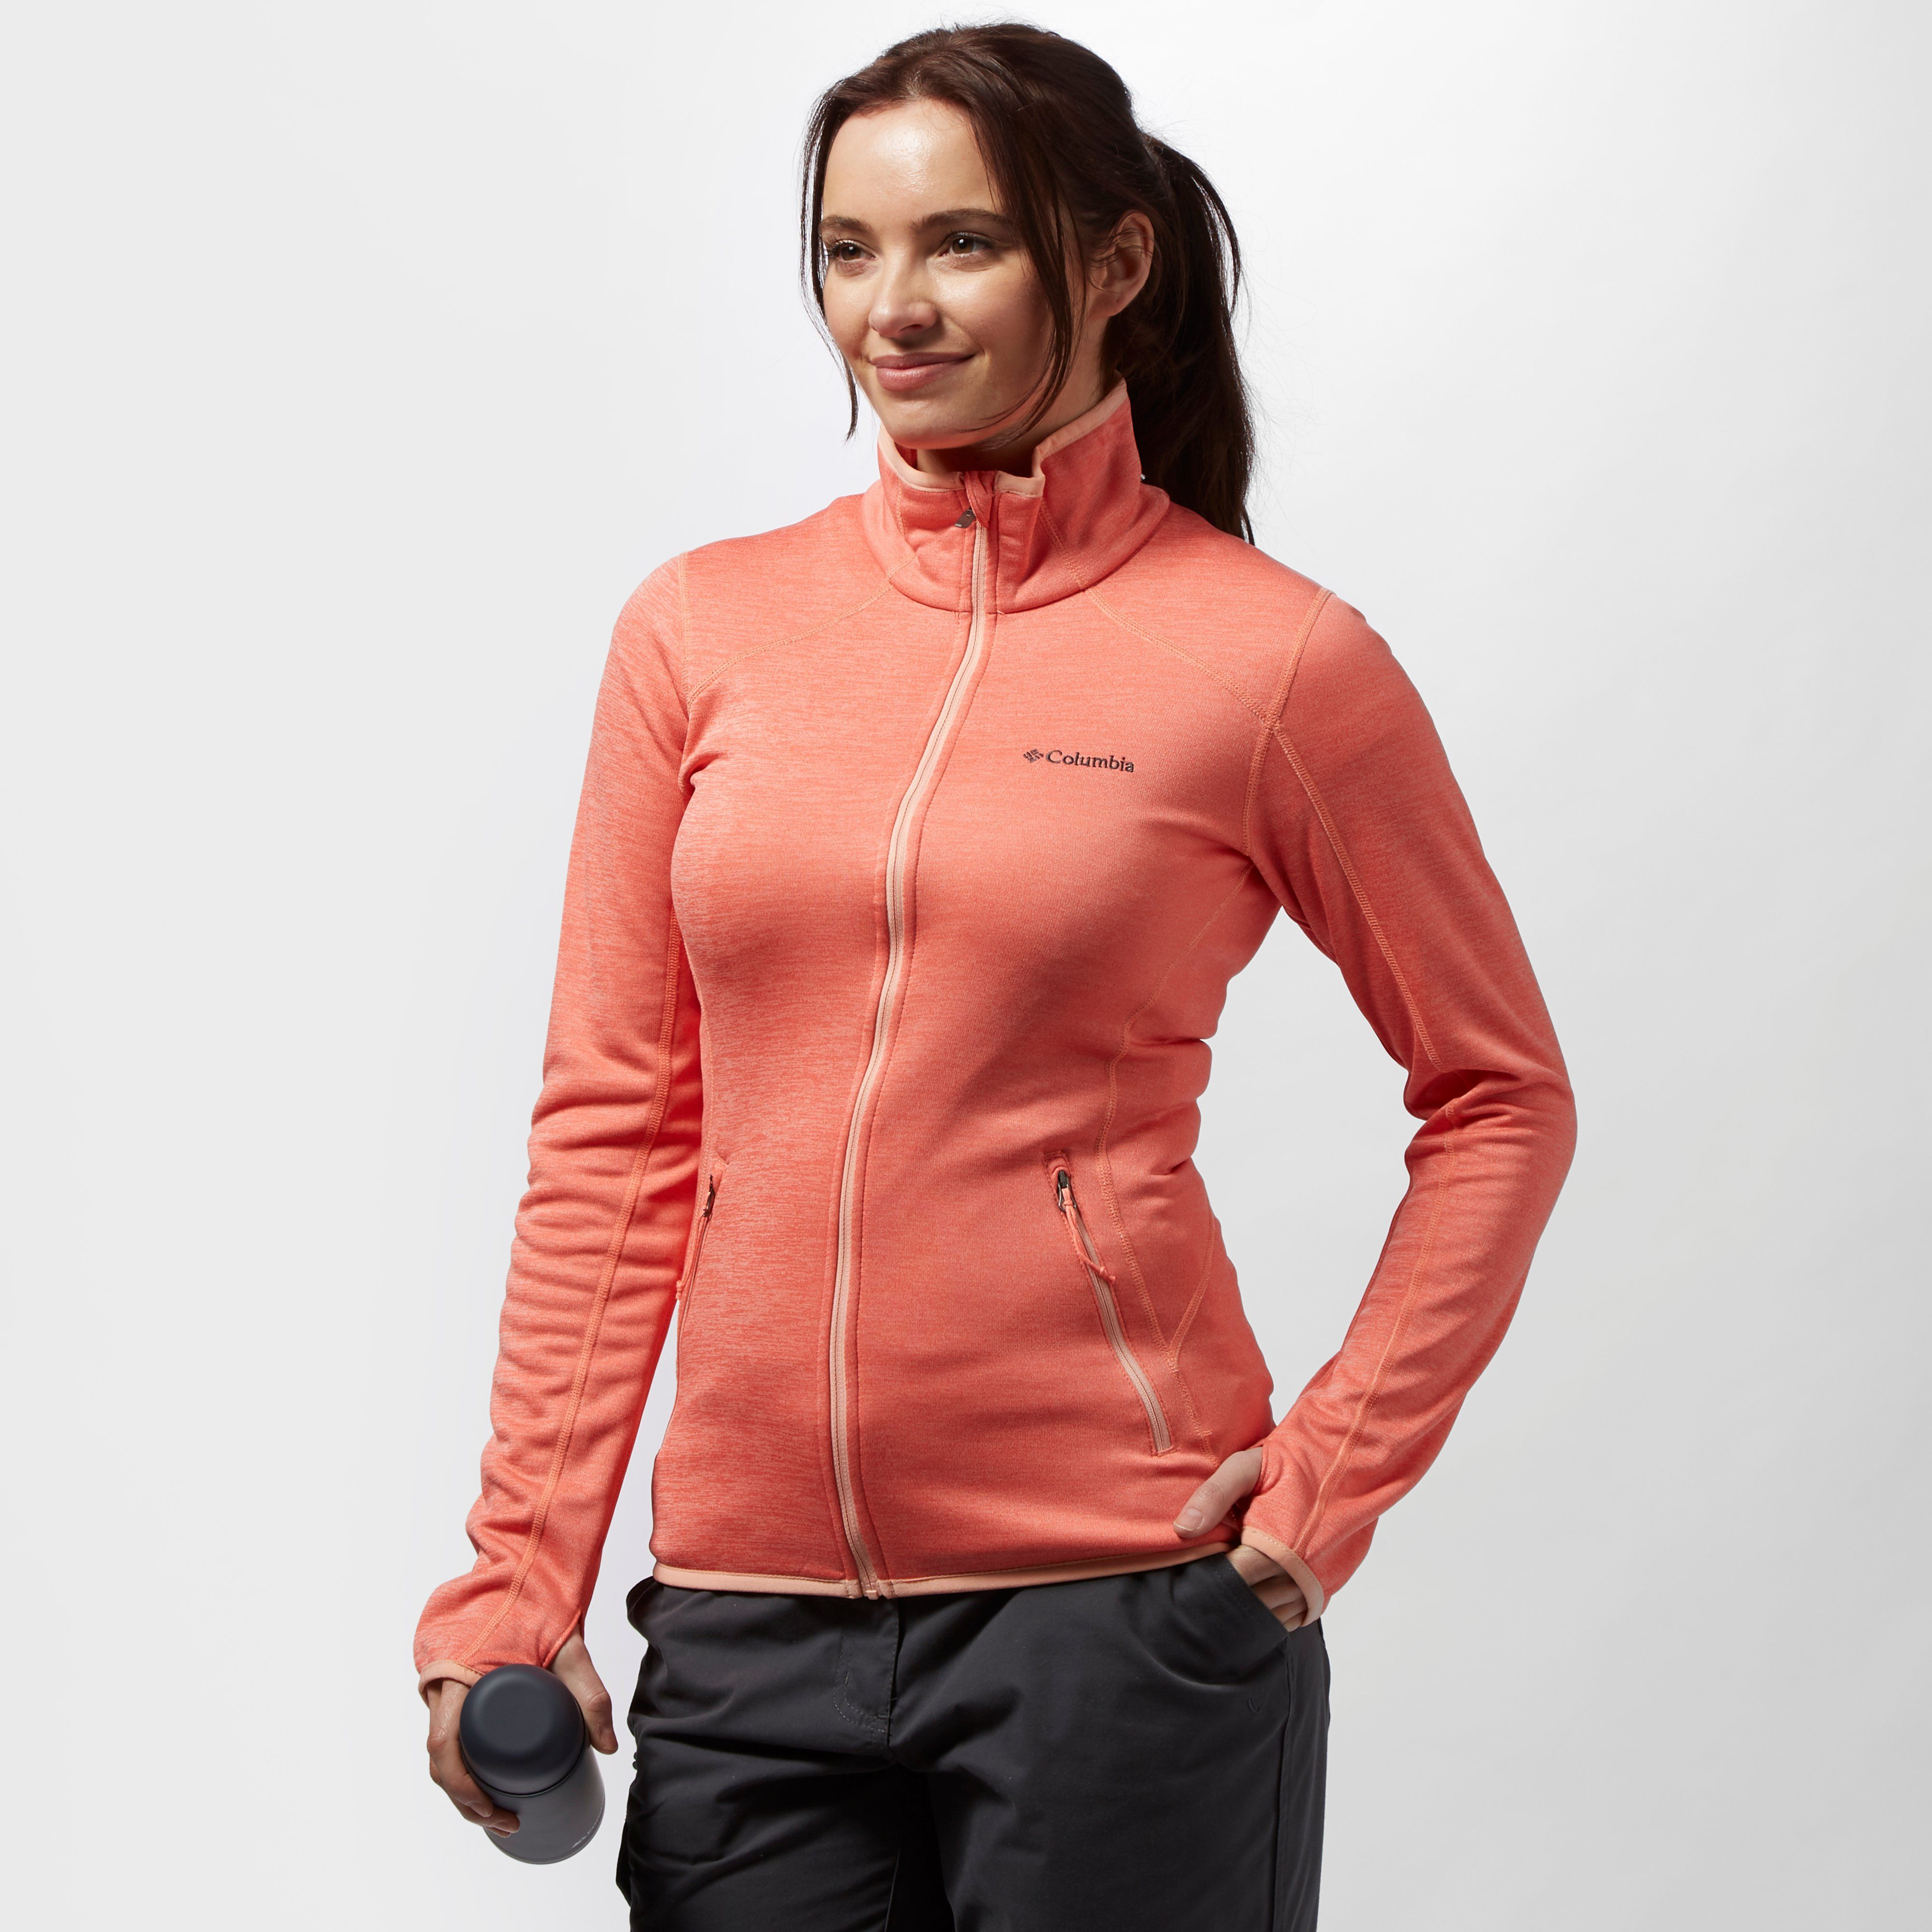 COLUMBIA Women's Sapphire Trail Full Zip Fleece